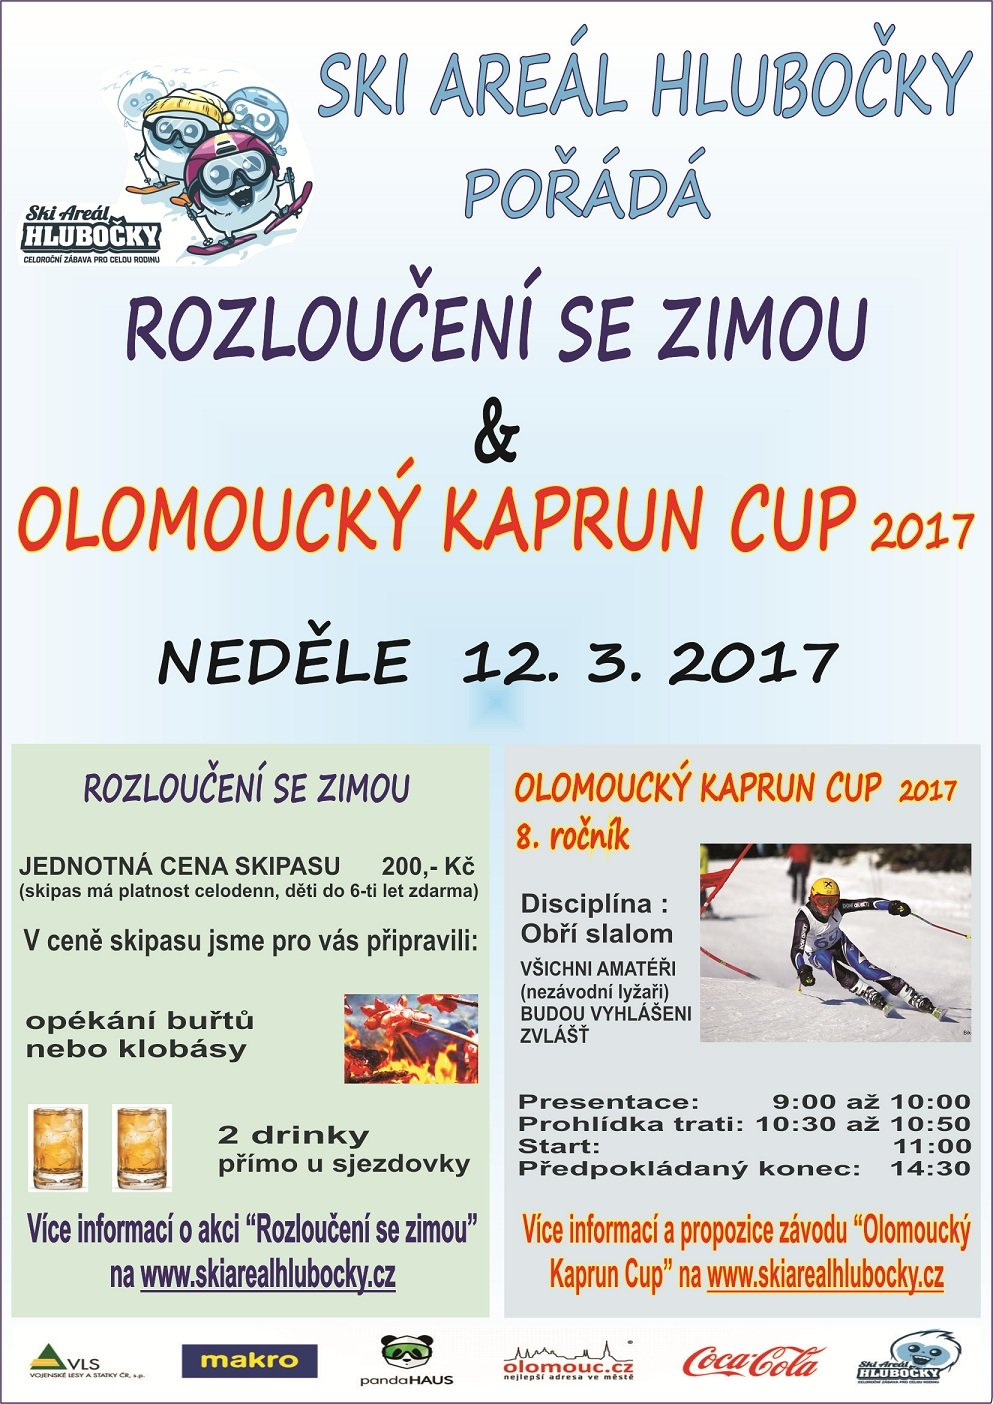 Olomoucký Kaprun Cup 2017 - ©Ski areál Hlubočky